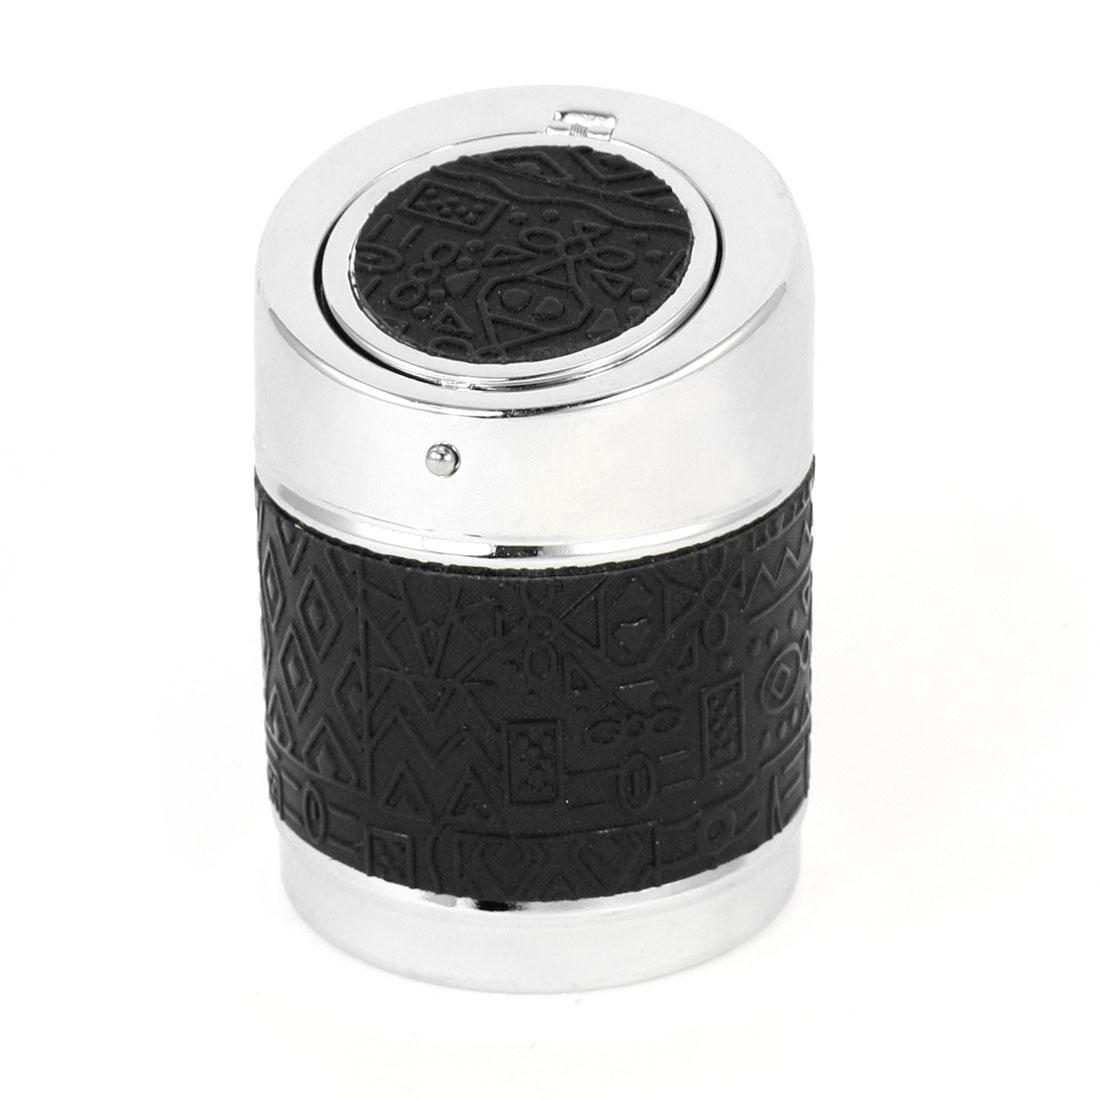 Black Irregular Pattern Round Cigar Ash Holder Container Ashtray